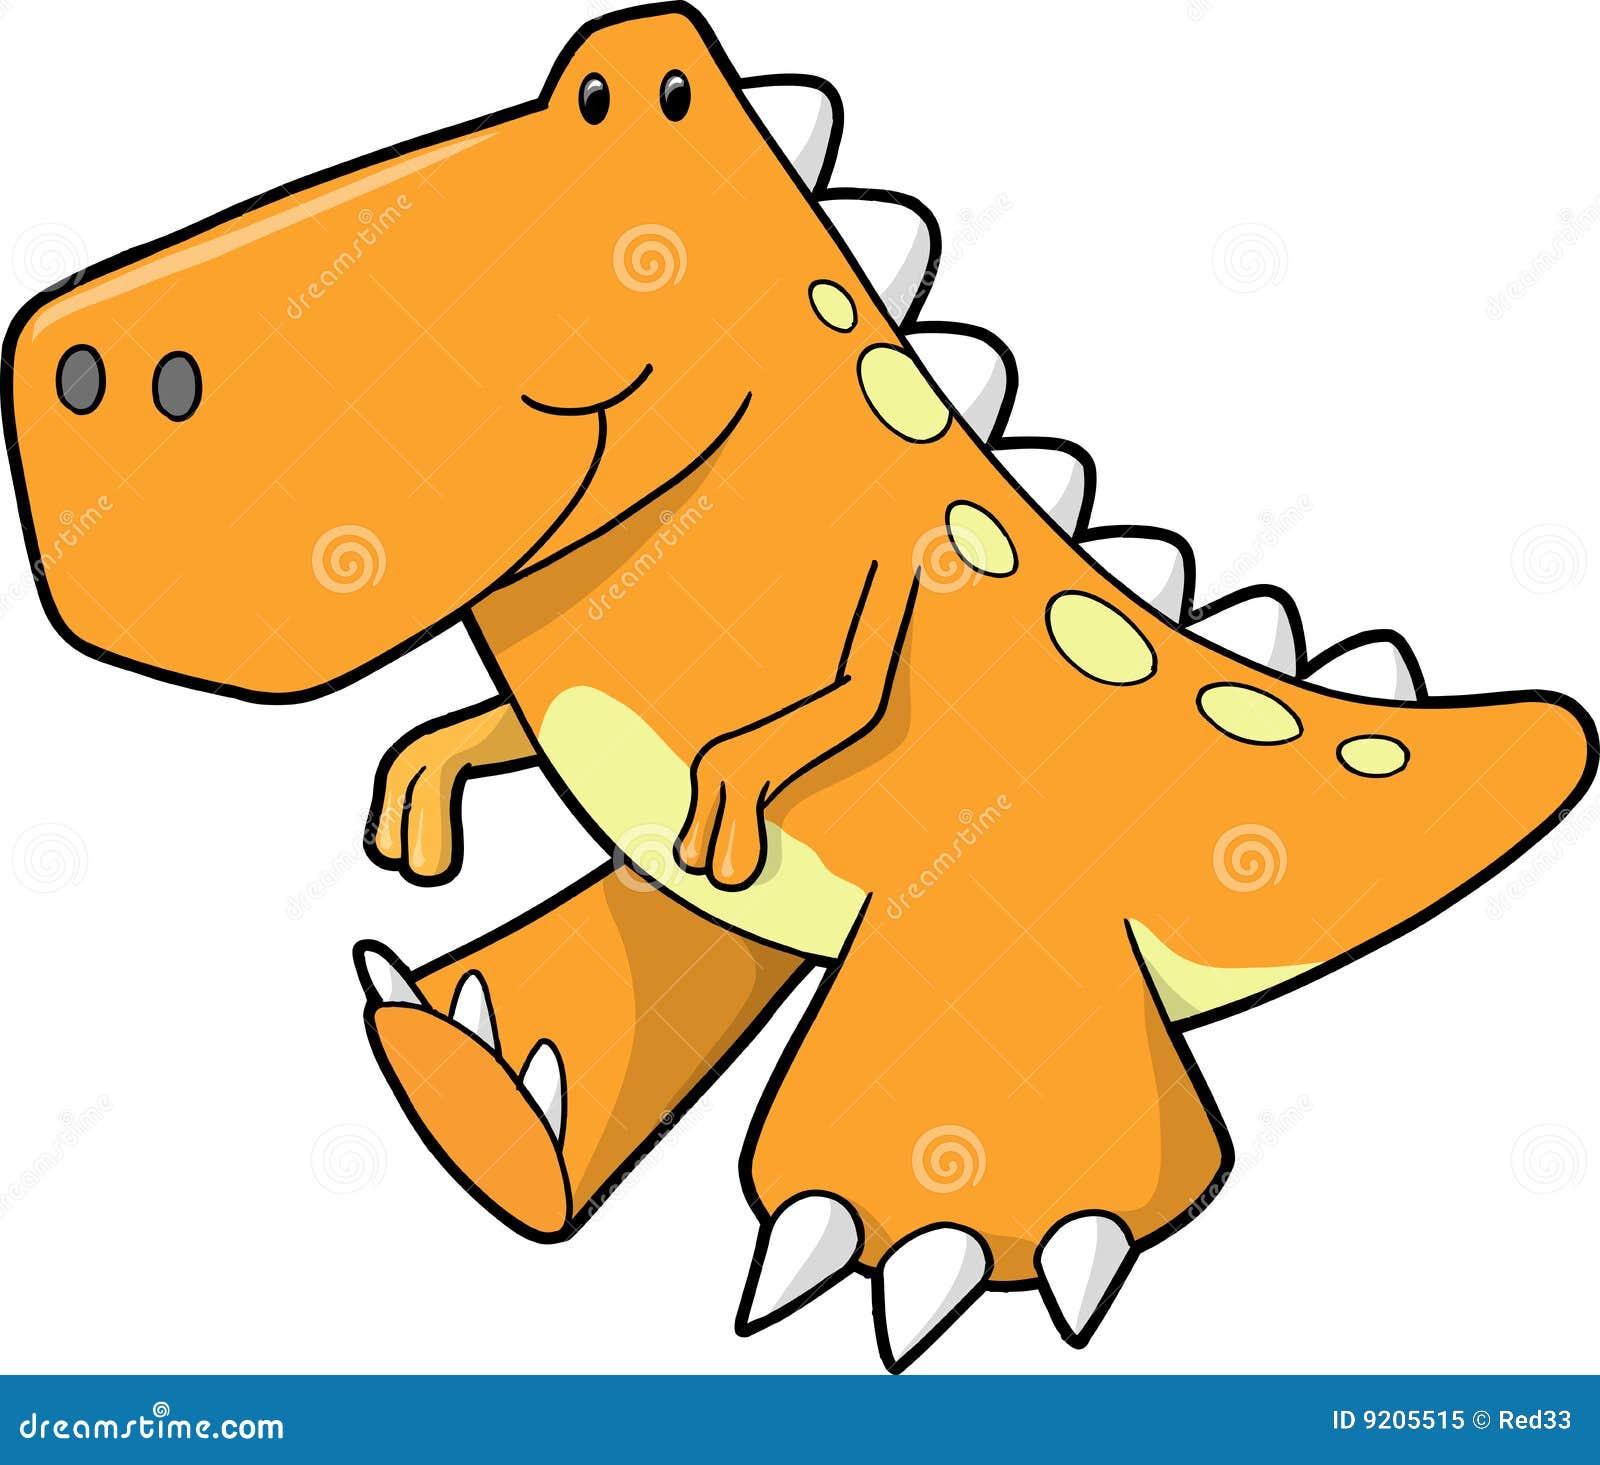 Cute Orange Dinosaur Vector Royalty Free Stock Photo - Image: 9205515